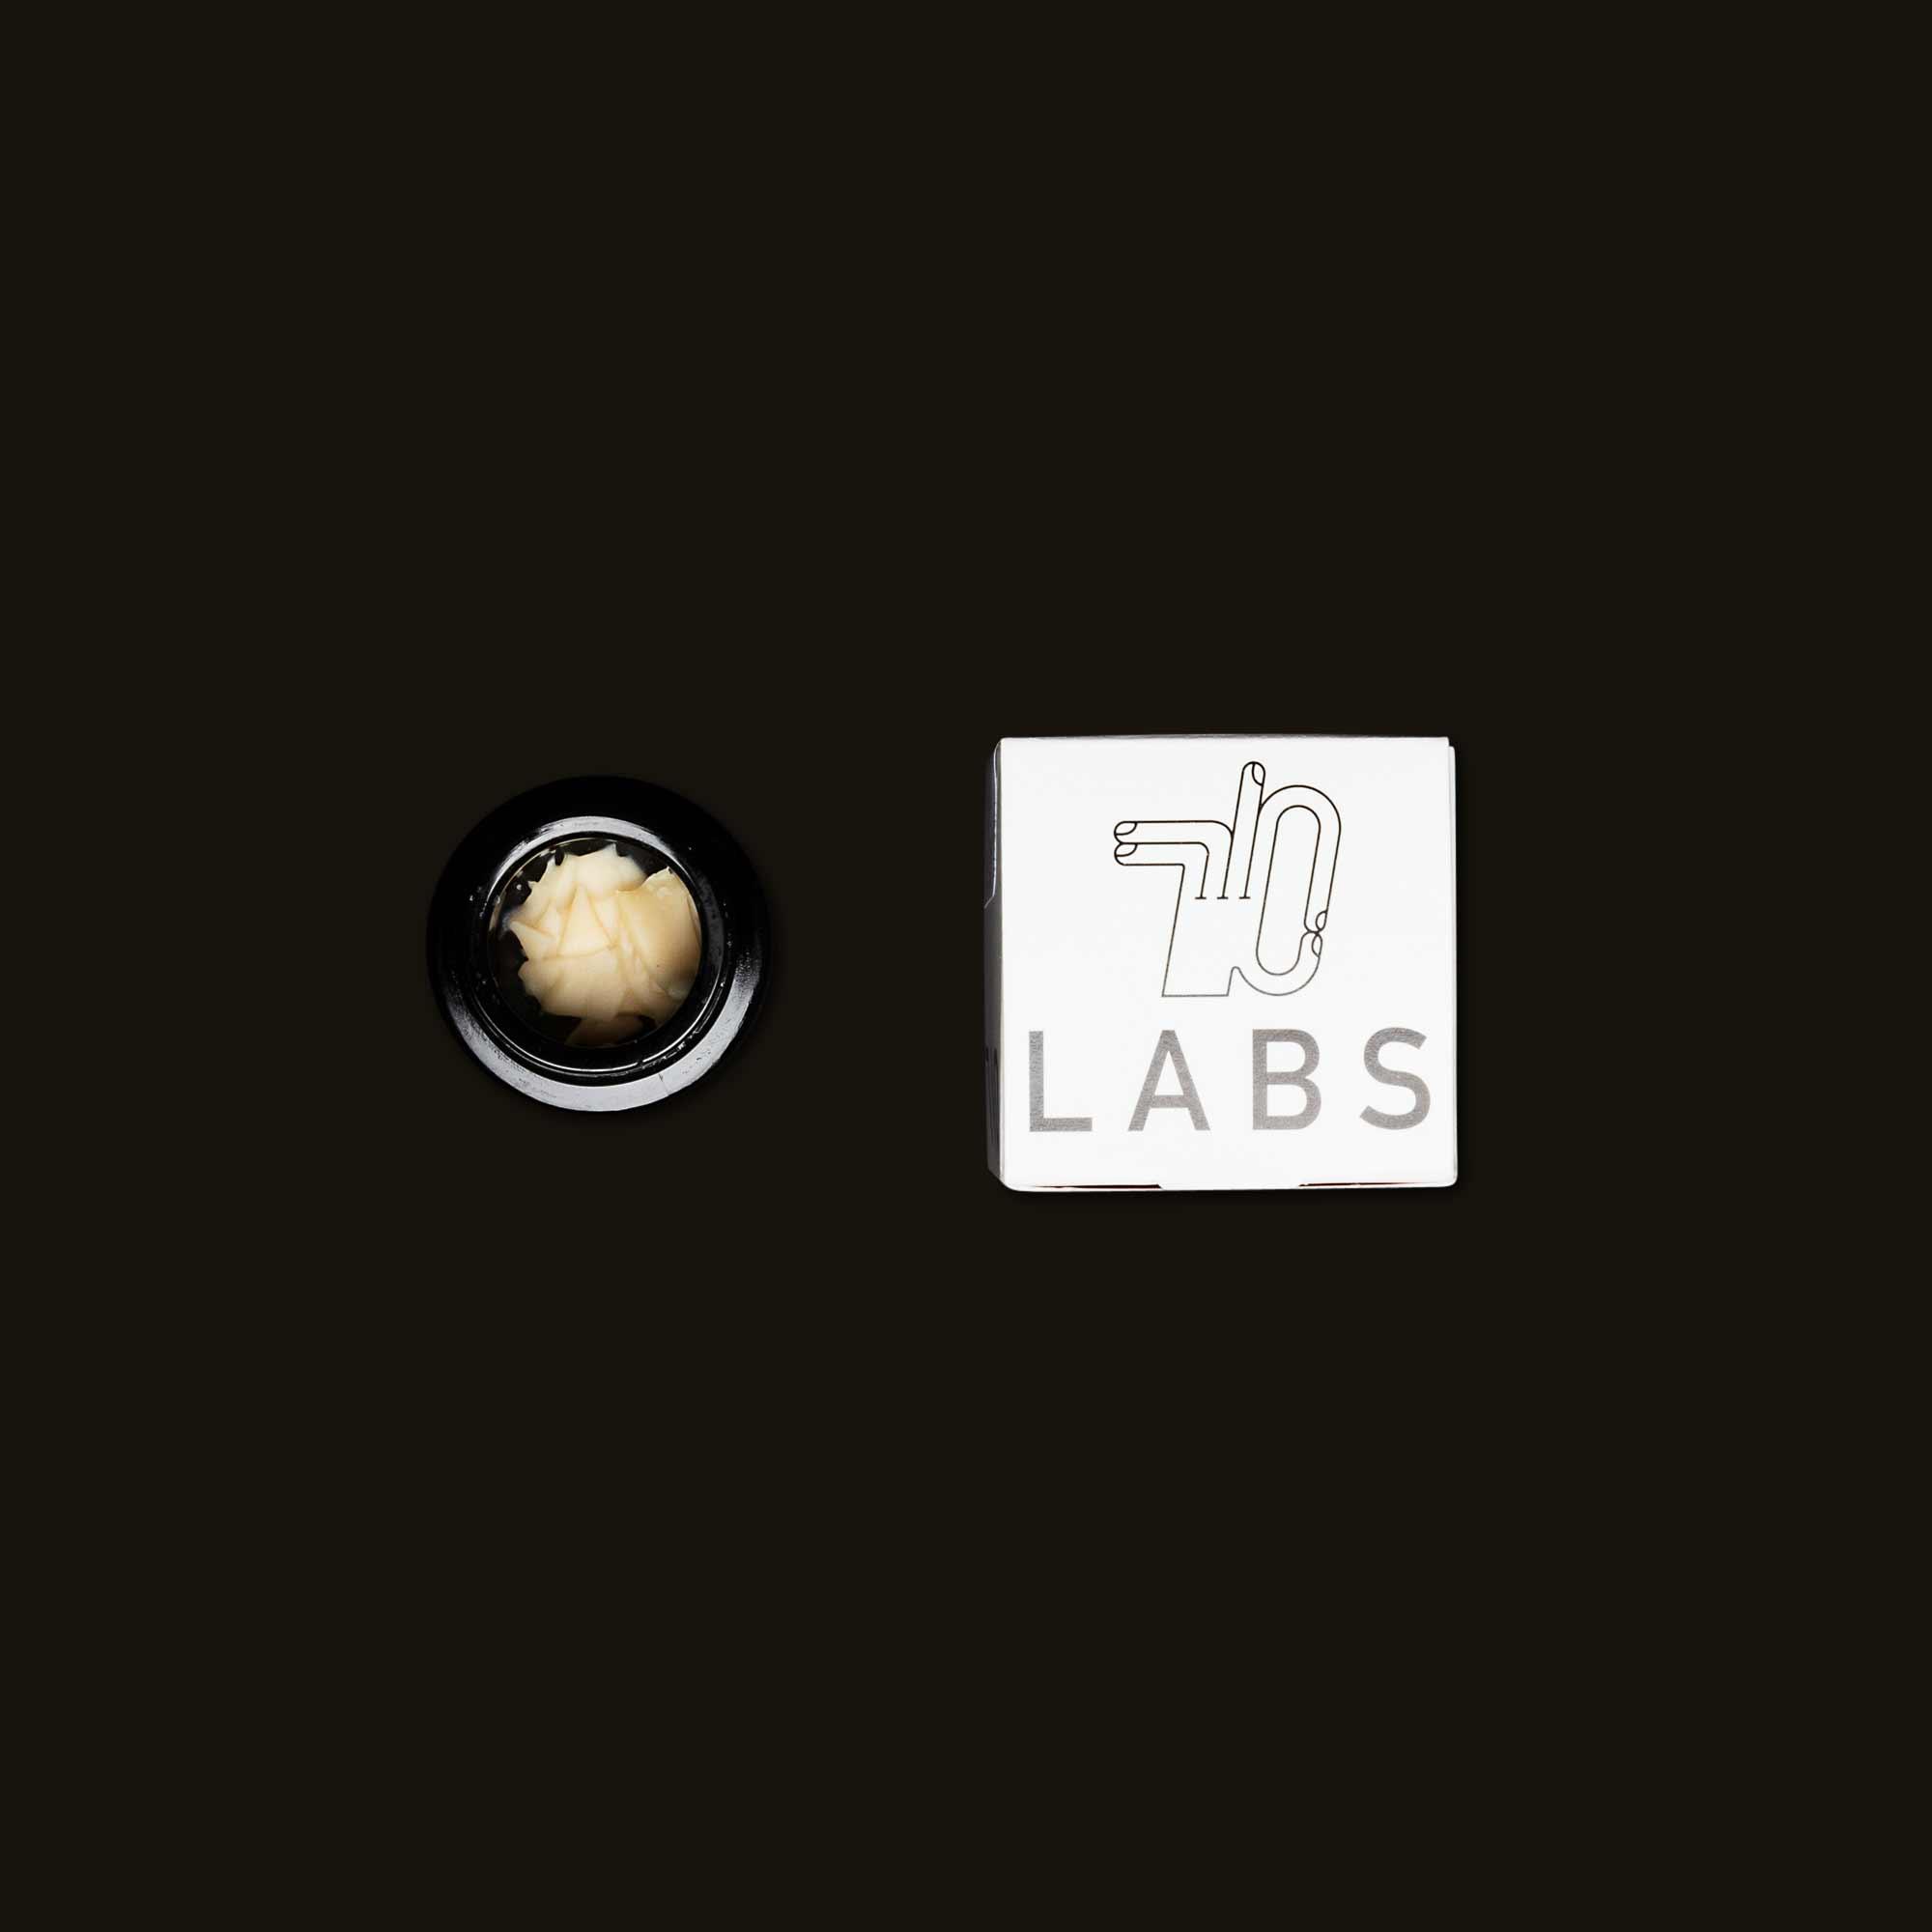 710 Labs Biesel #1 X Lemon Live Badder